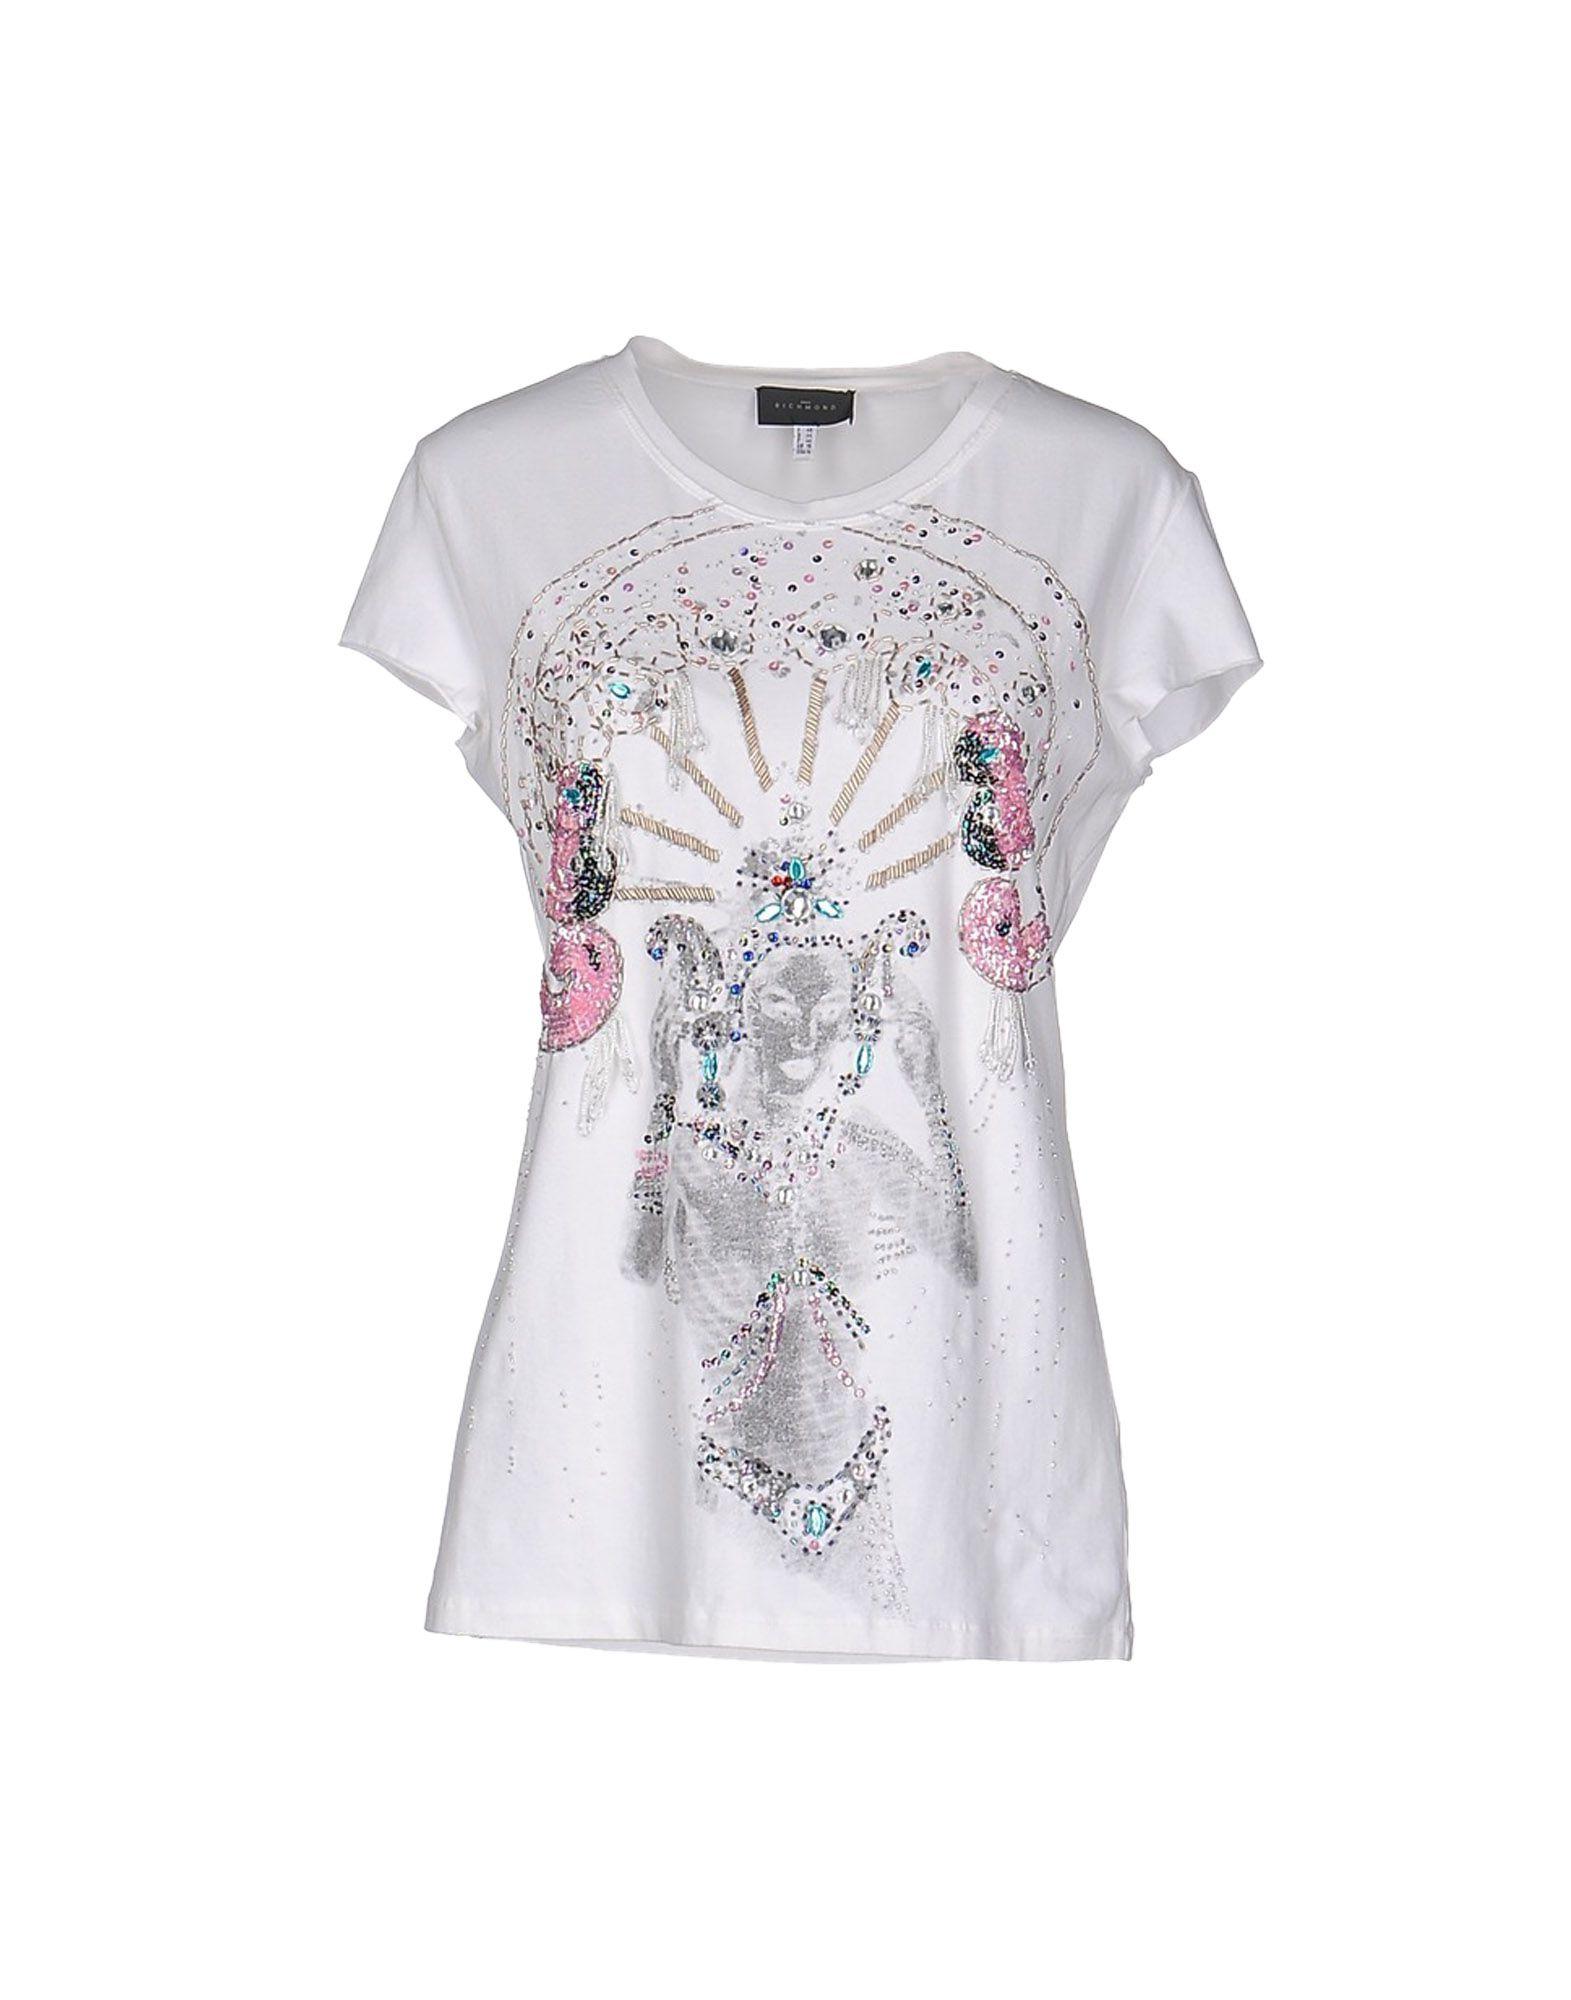 Lyst john richmond t shirt in white for T shirt printing richmond va